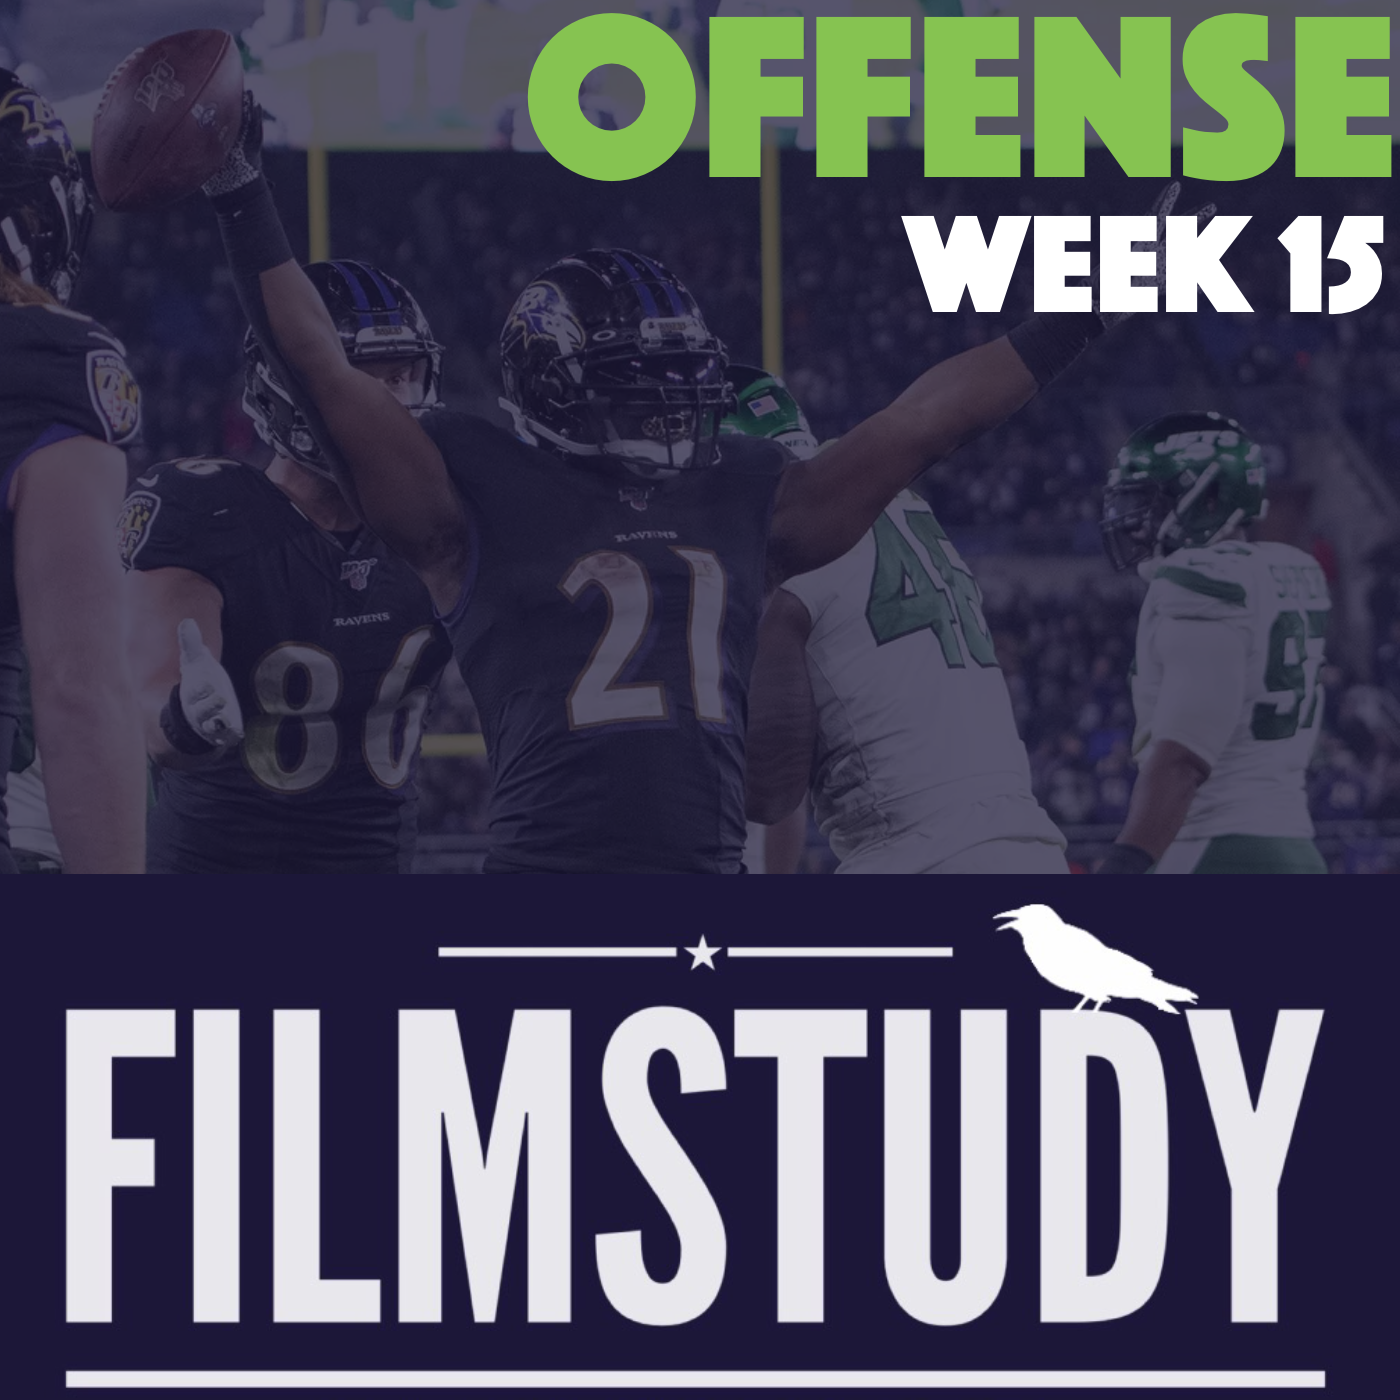 Offense Notes – Week 15 – Jets at Ravens